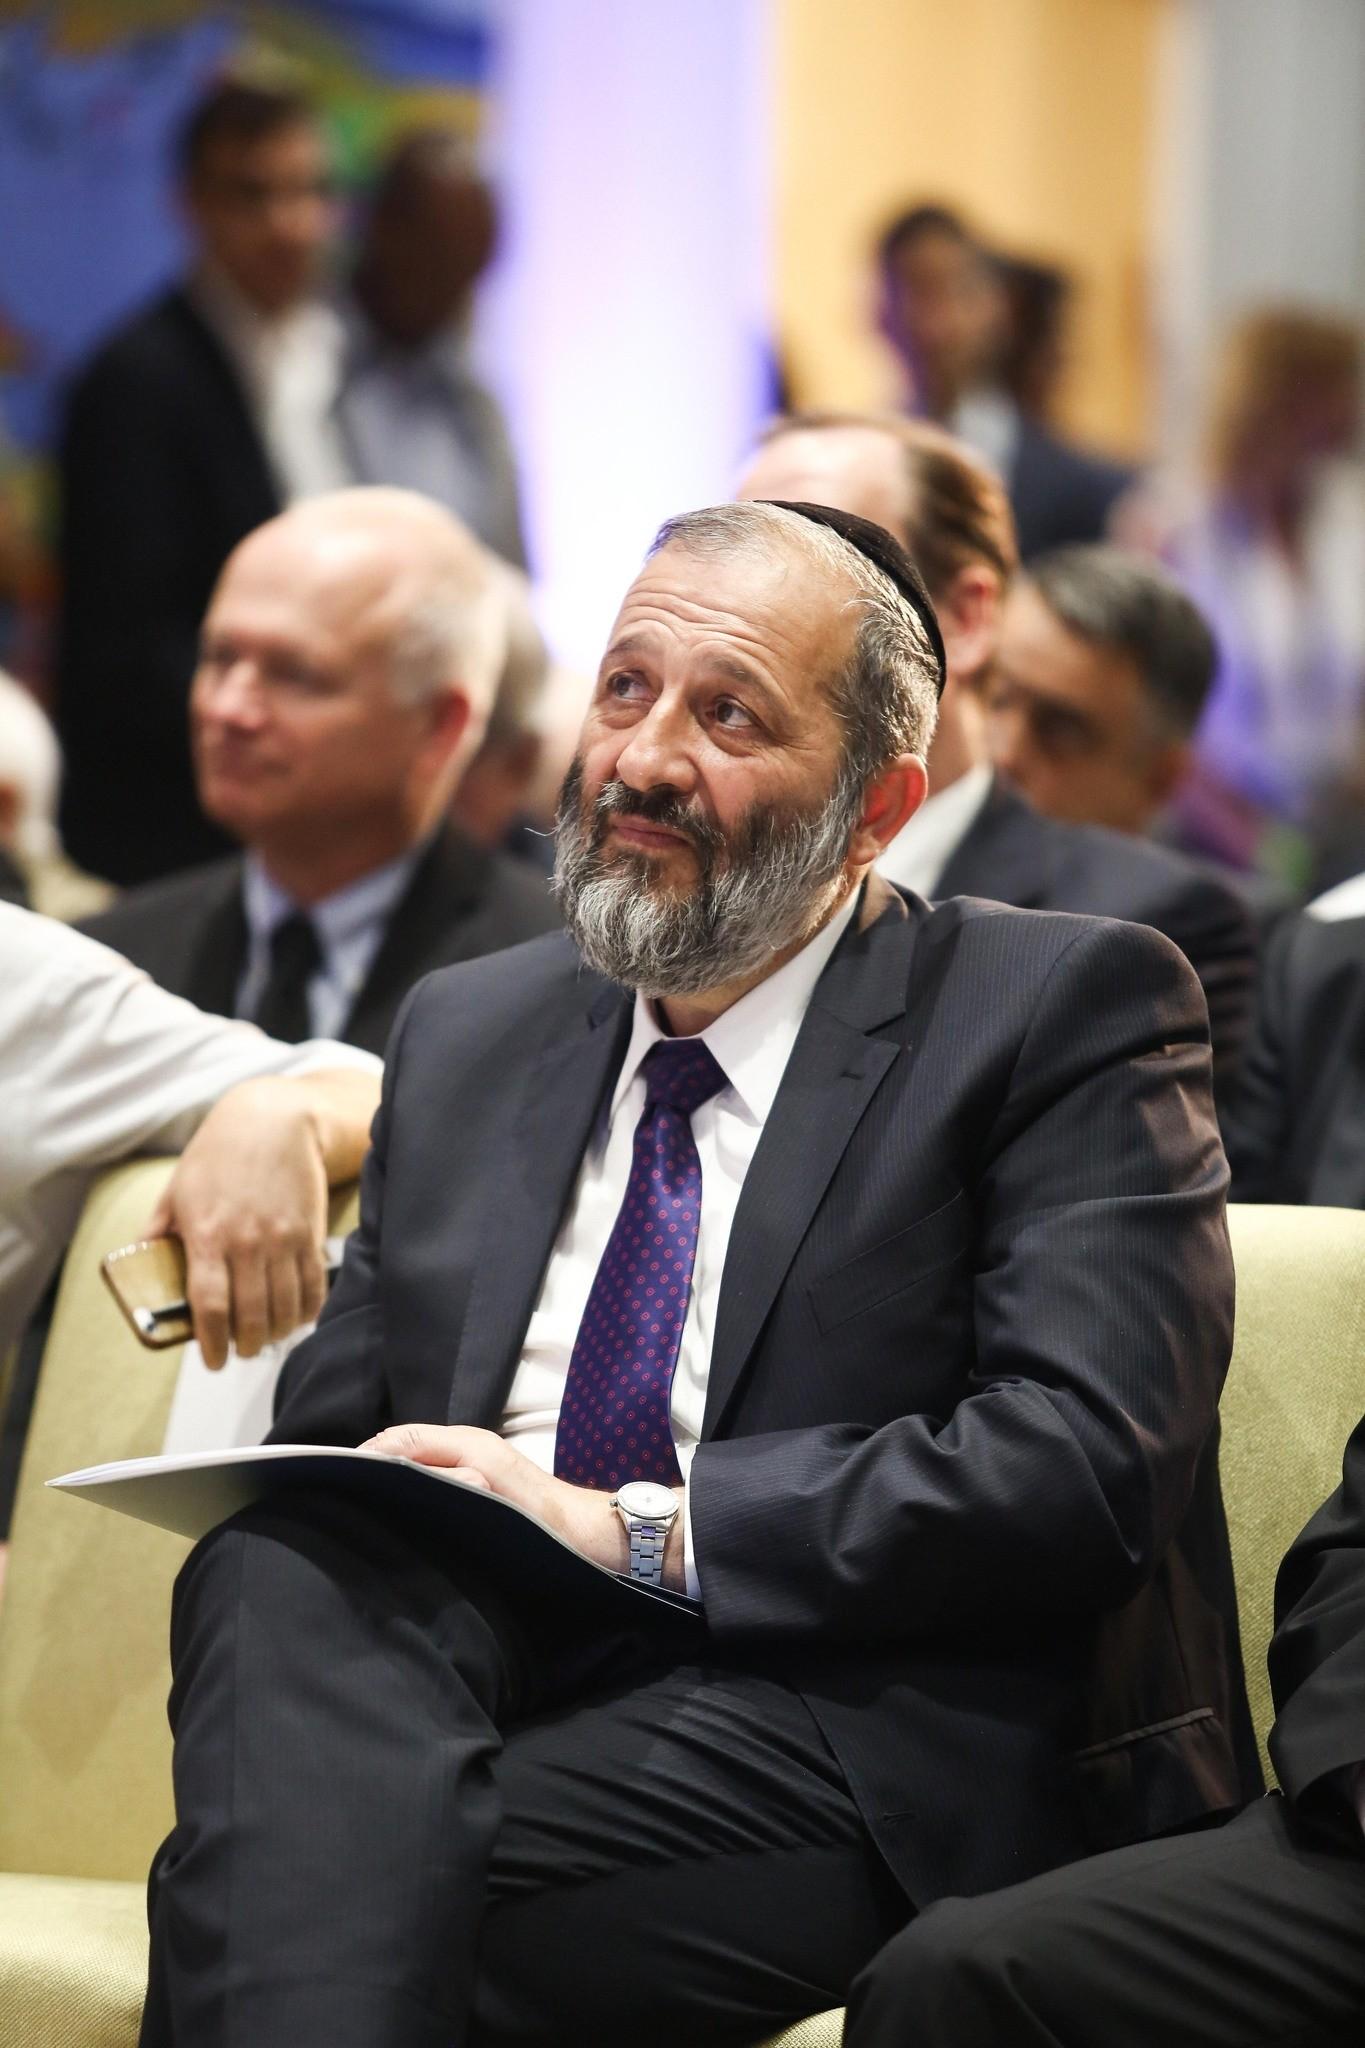 Israeli Interior Minister Aryeh Deri at the Herzliya Conference in June 2016. (Photo by Adi Cohen Zedek)